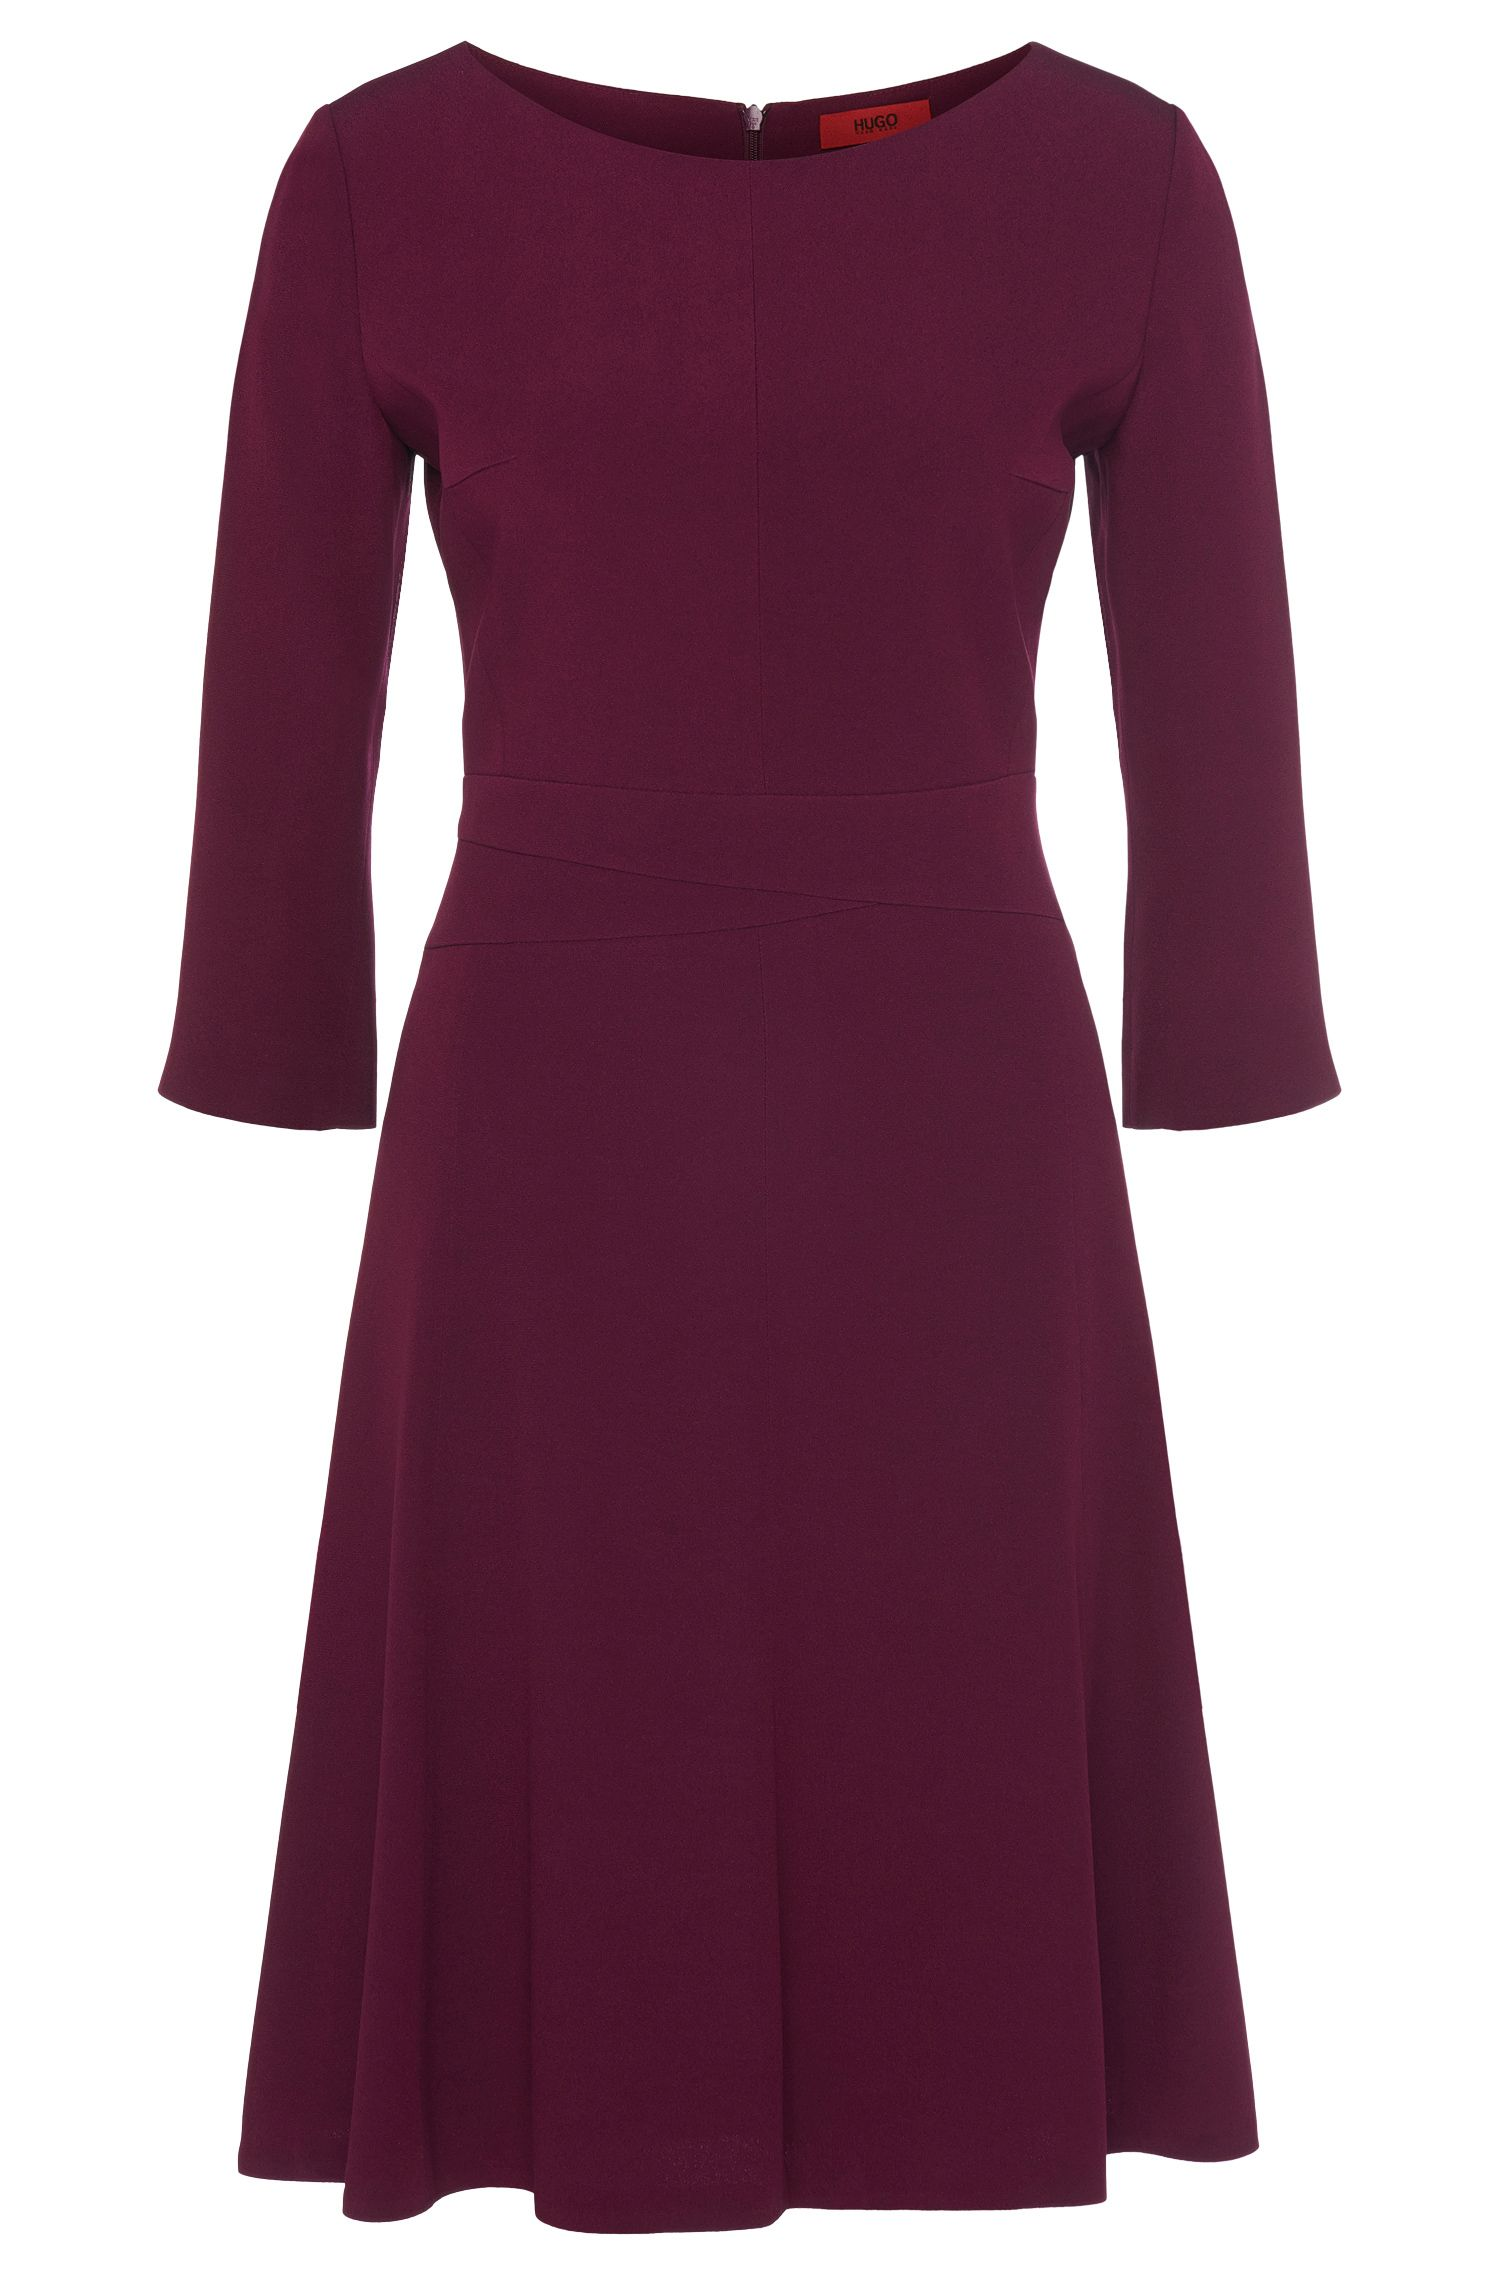 Tailliertes Kleid mit 7/8-Ärmeln: 'Kusima'